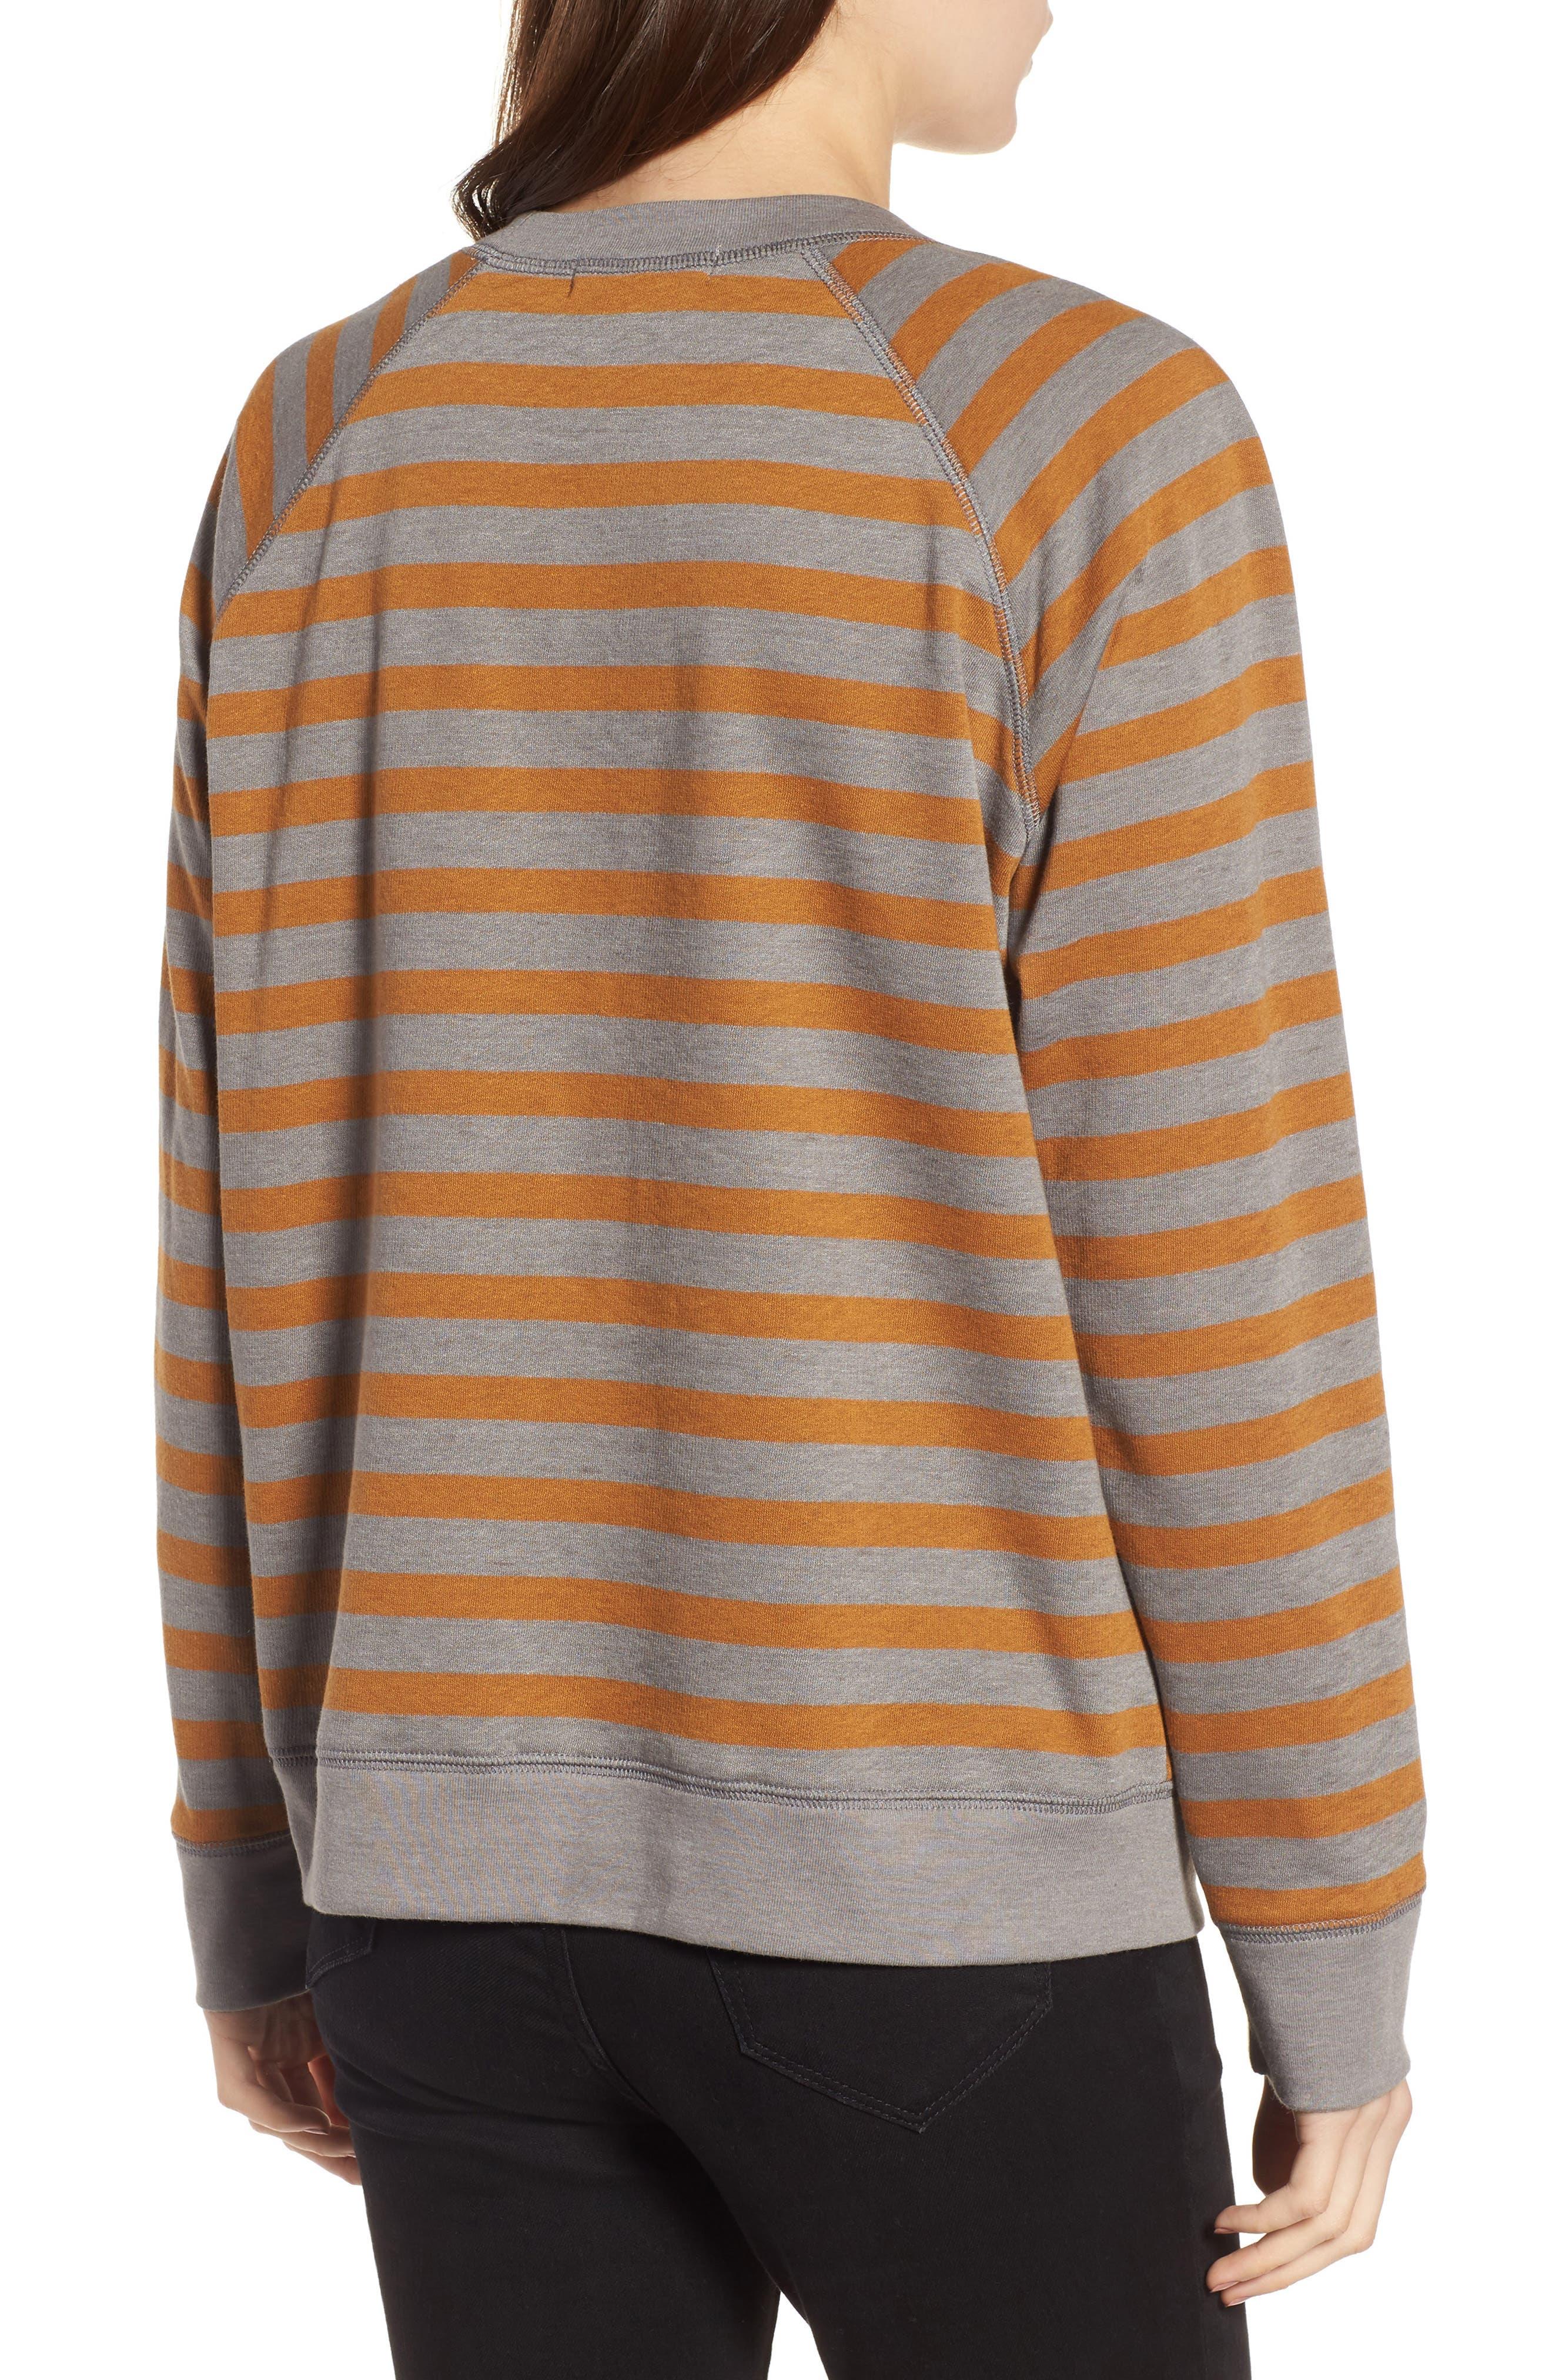 Crewneck Sweatshirt,                             Alternate thumbnail 2, color,                             021